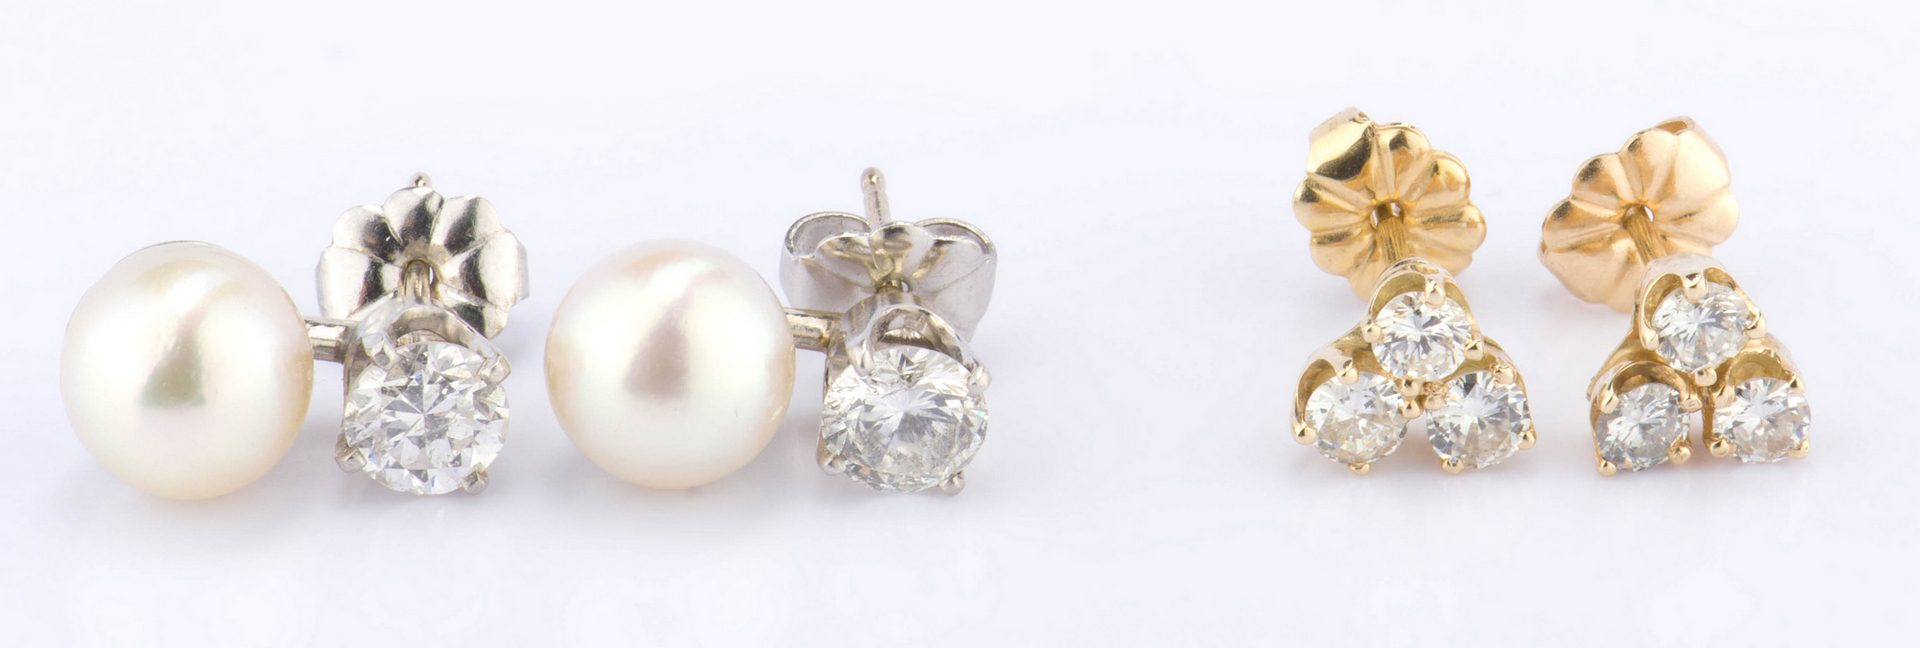 Lot 888: Two Pair Diamond Earrings